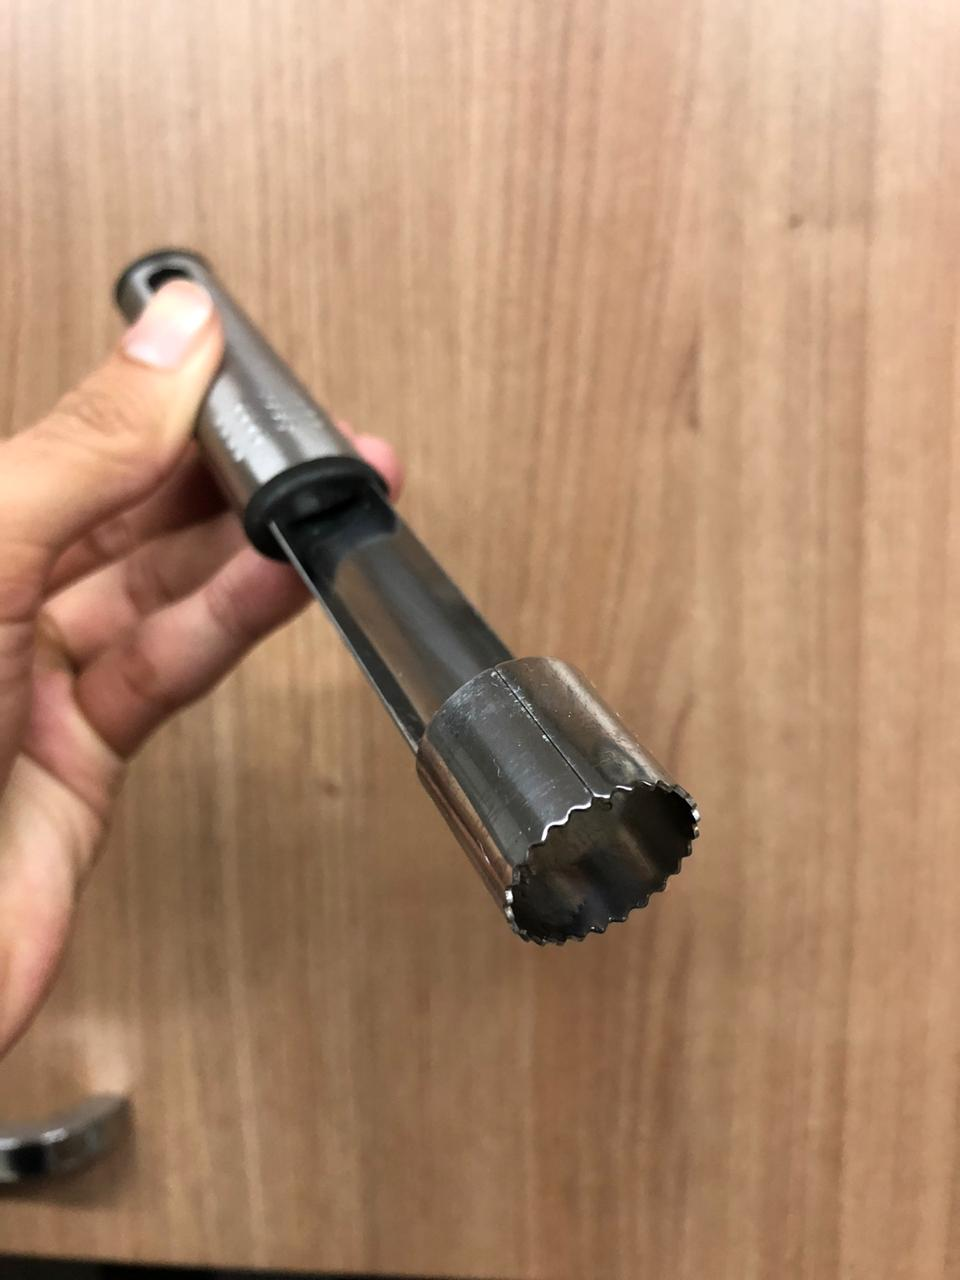 extrator de polpa para frutas aço inox qualidade mimostyle 19cm